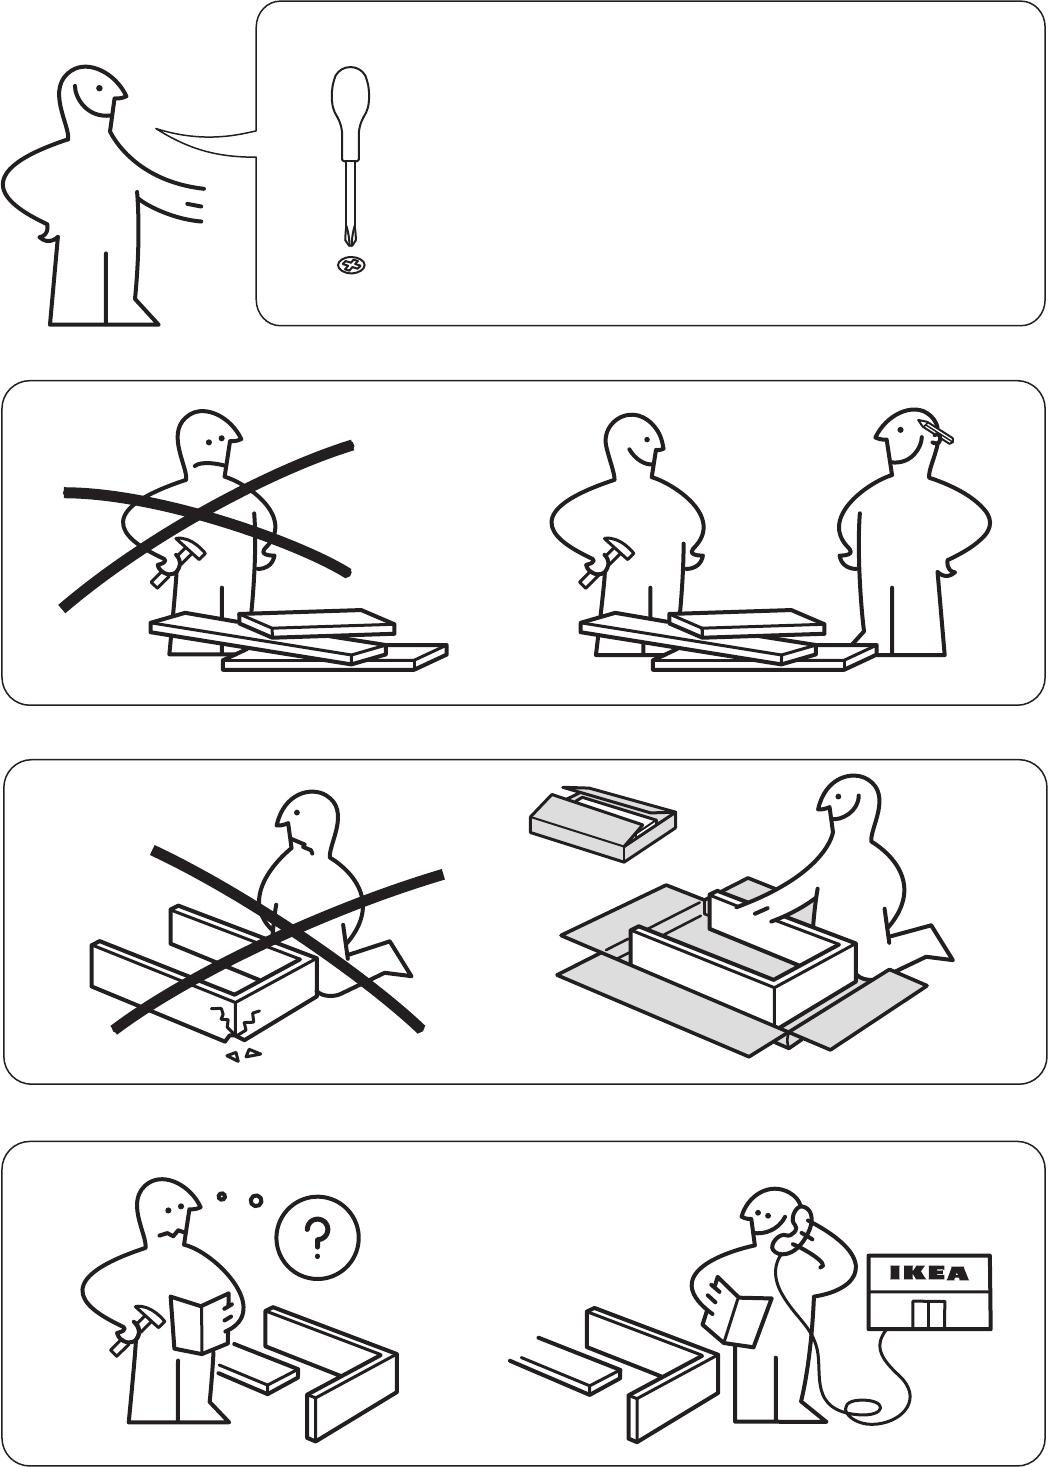 Wonderbaarlijk Manual Ikea GALANT Vergadertafel (page 2 of 8) (Danish, German LS-15